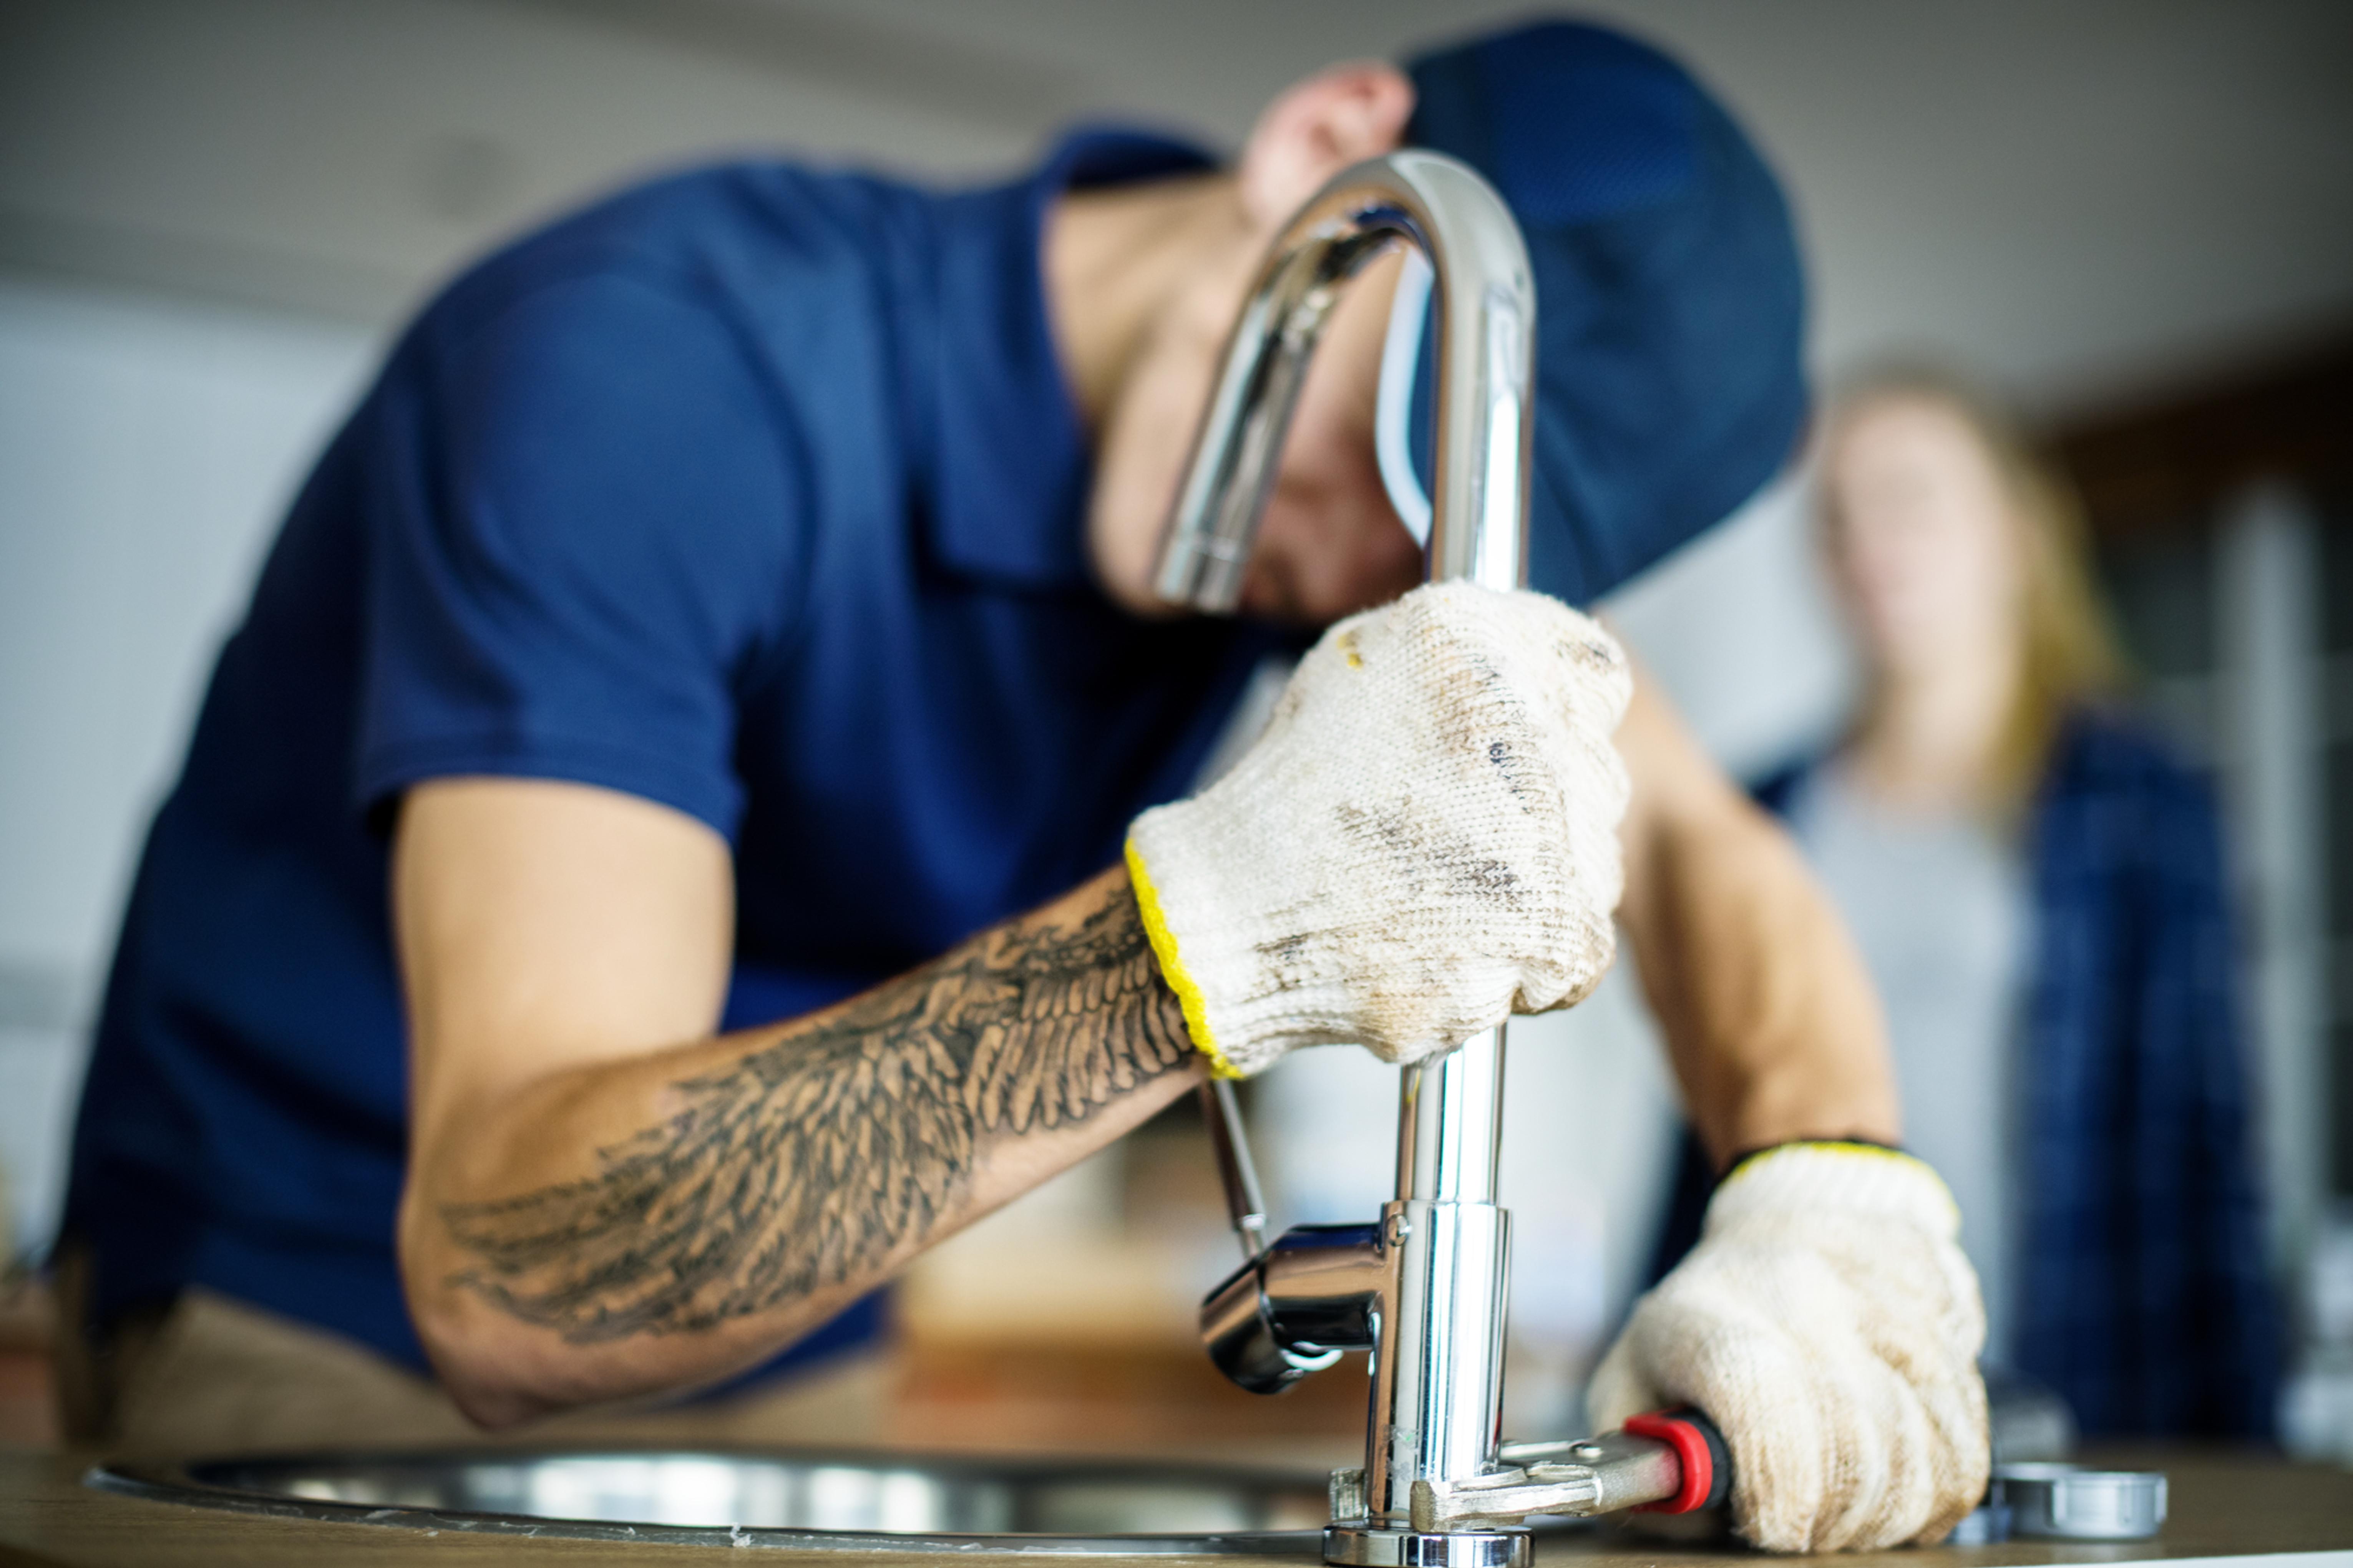 Plumbing or sanitary خدمات السباكة